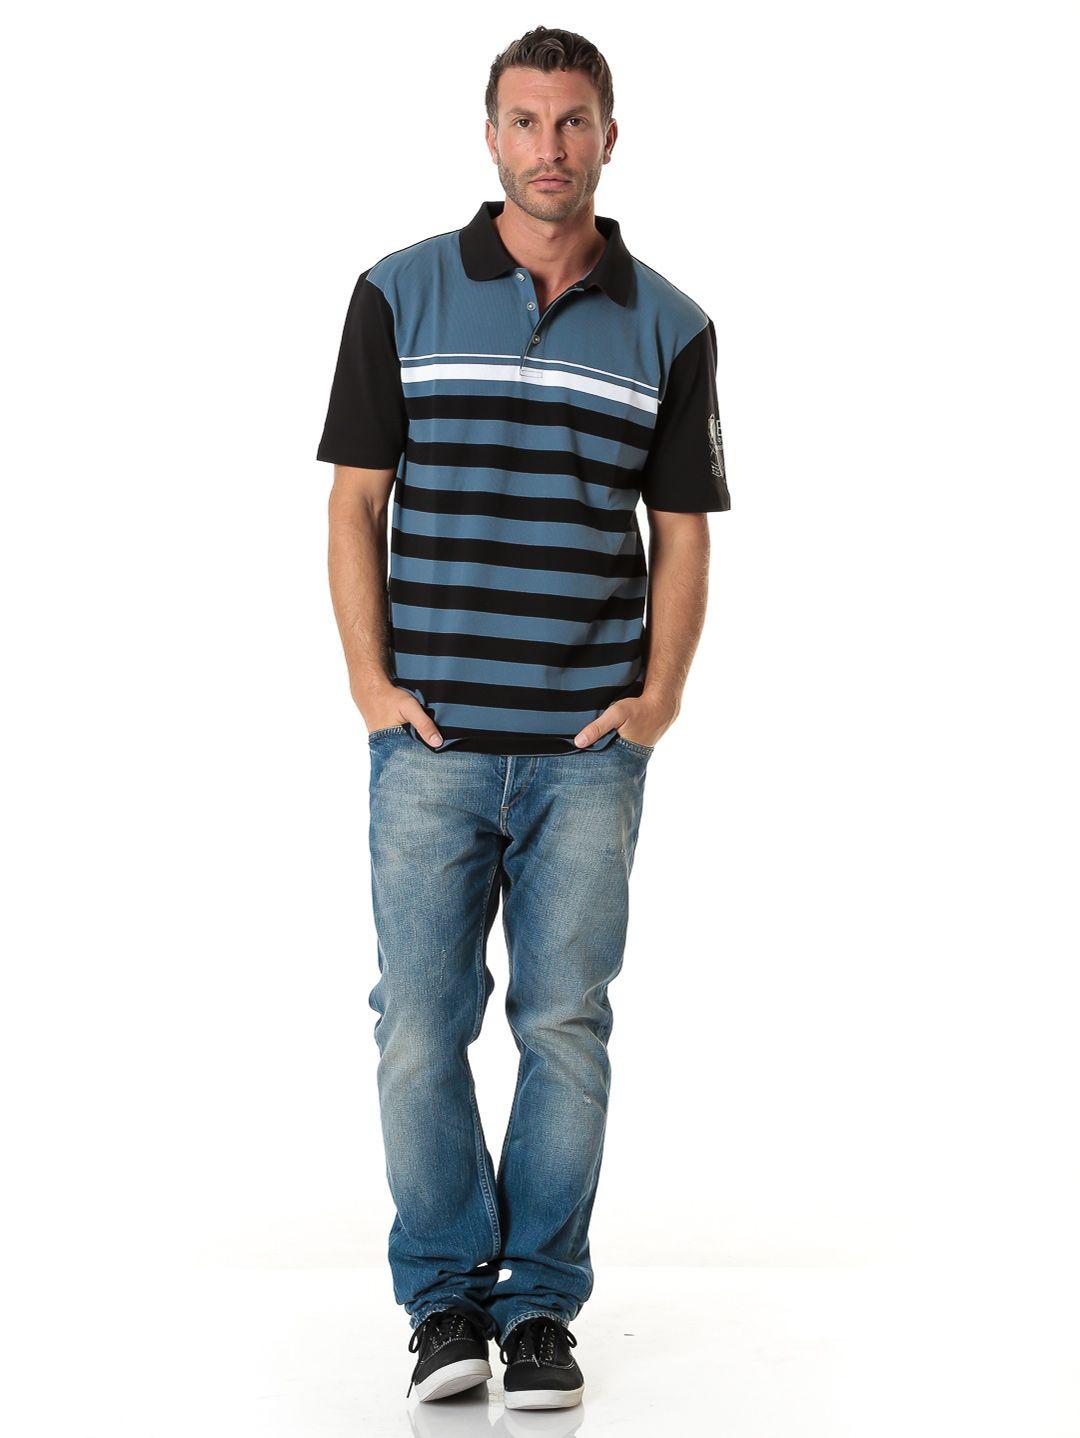 Ea7 Emporio Armani Polo Shirt Online Now At Sukar Com Armani Polo Mens Tops Mens Tshirts